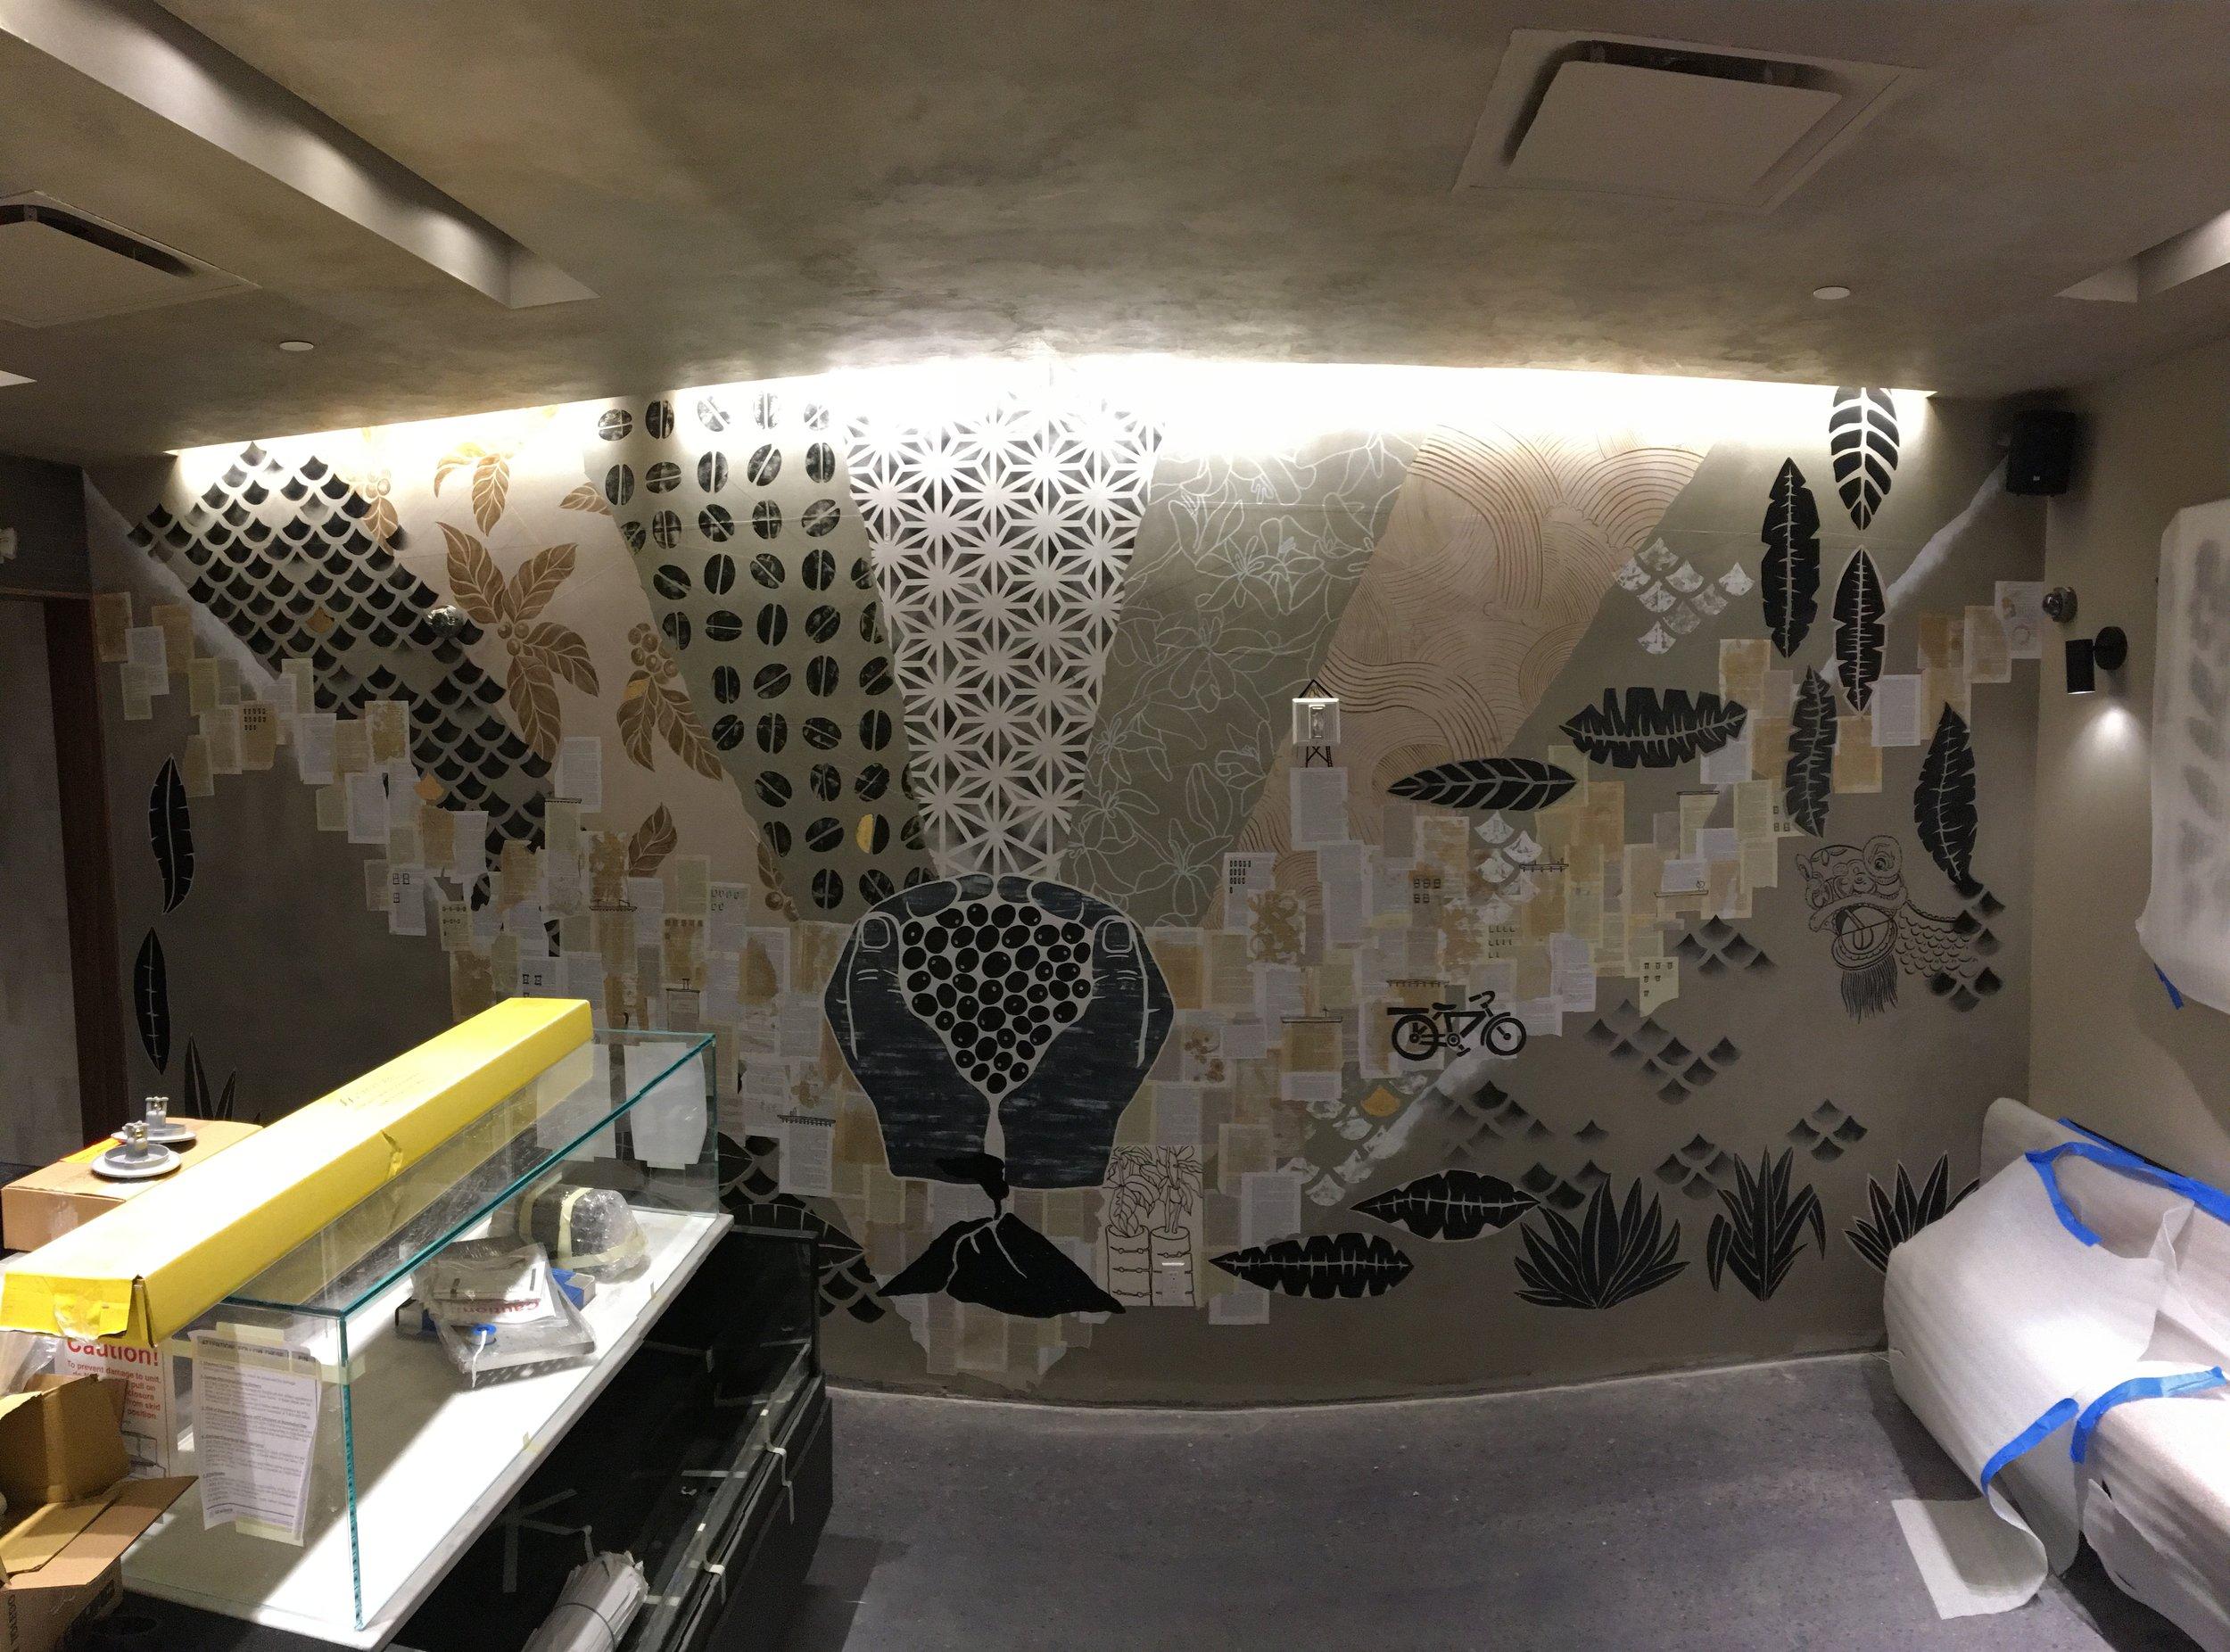 Hand painted, Wheatepaste - Chinatown, NYC